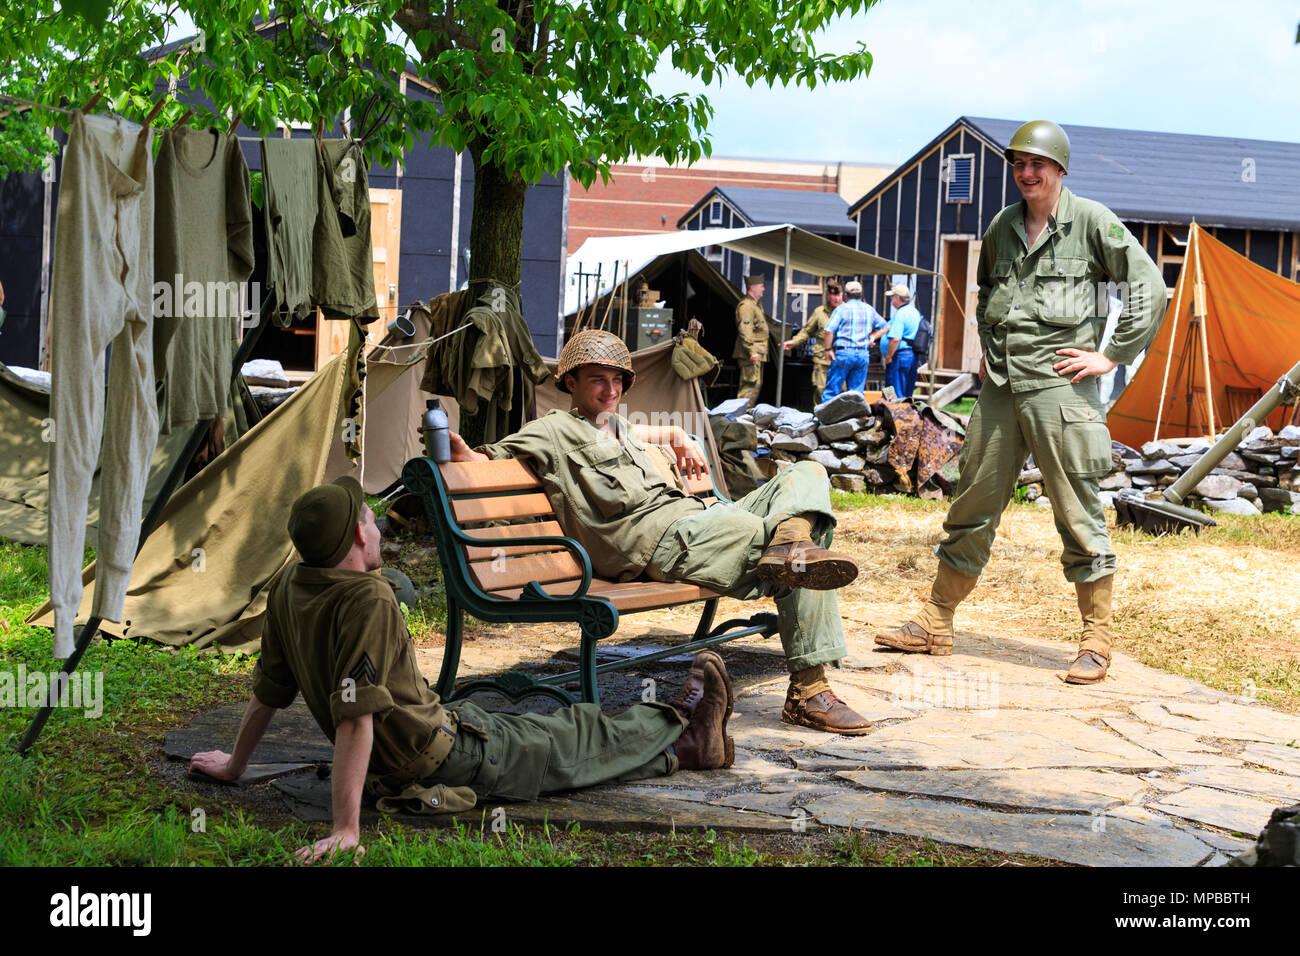 Carlisle, PA, USA - May 20, 2018: WWII Army soldier